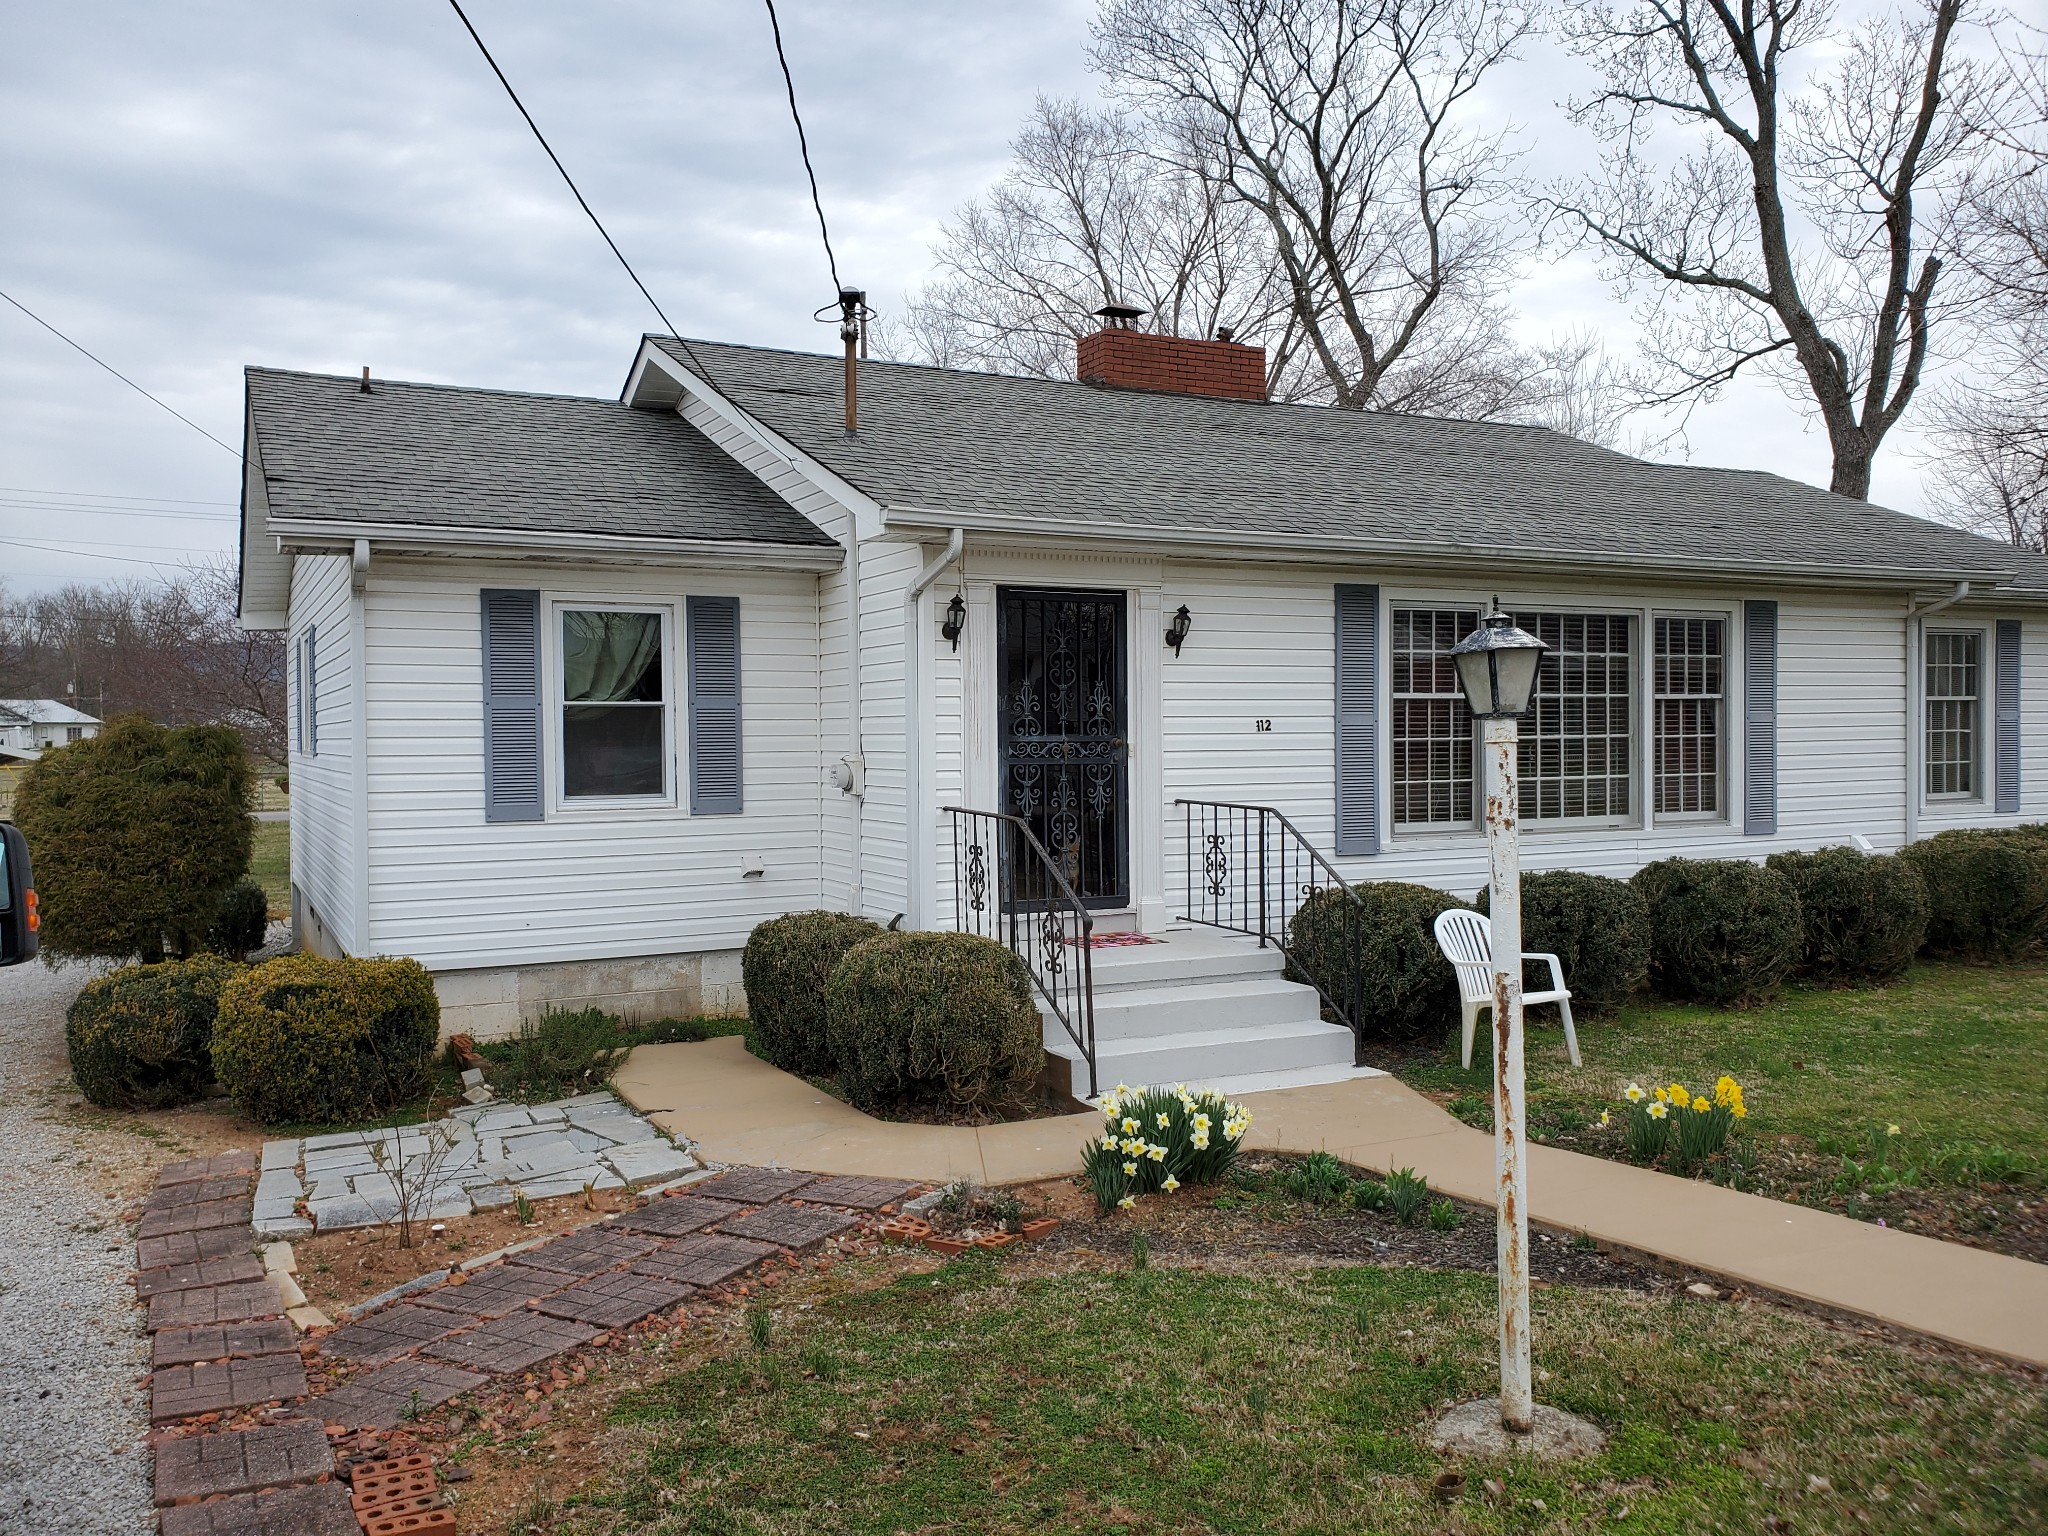 112 Allen St E Property Photo - Cowan, TN real estate listing